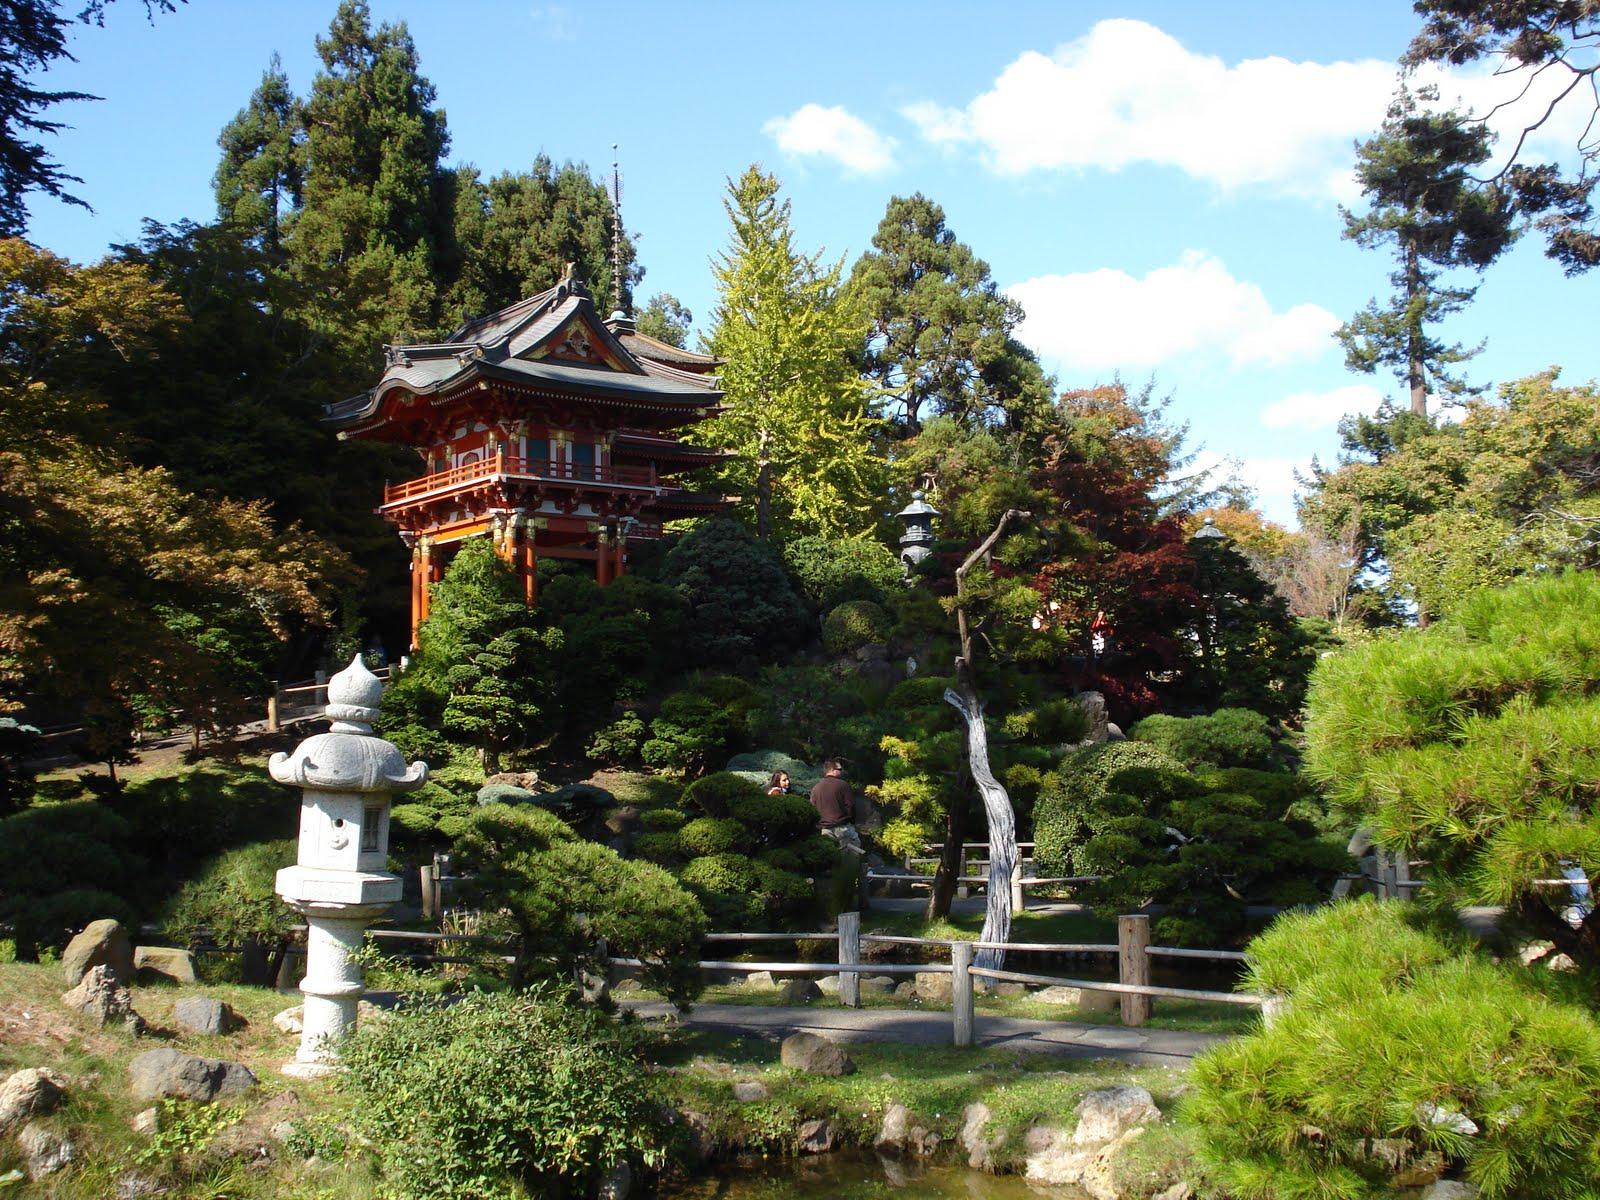 Vailima jard n de t japon s s f for Jardin japones hagiwara de san francisco